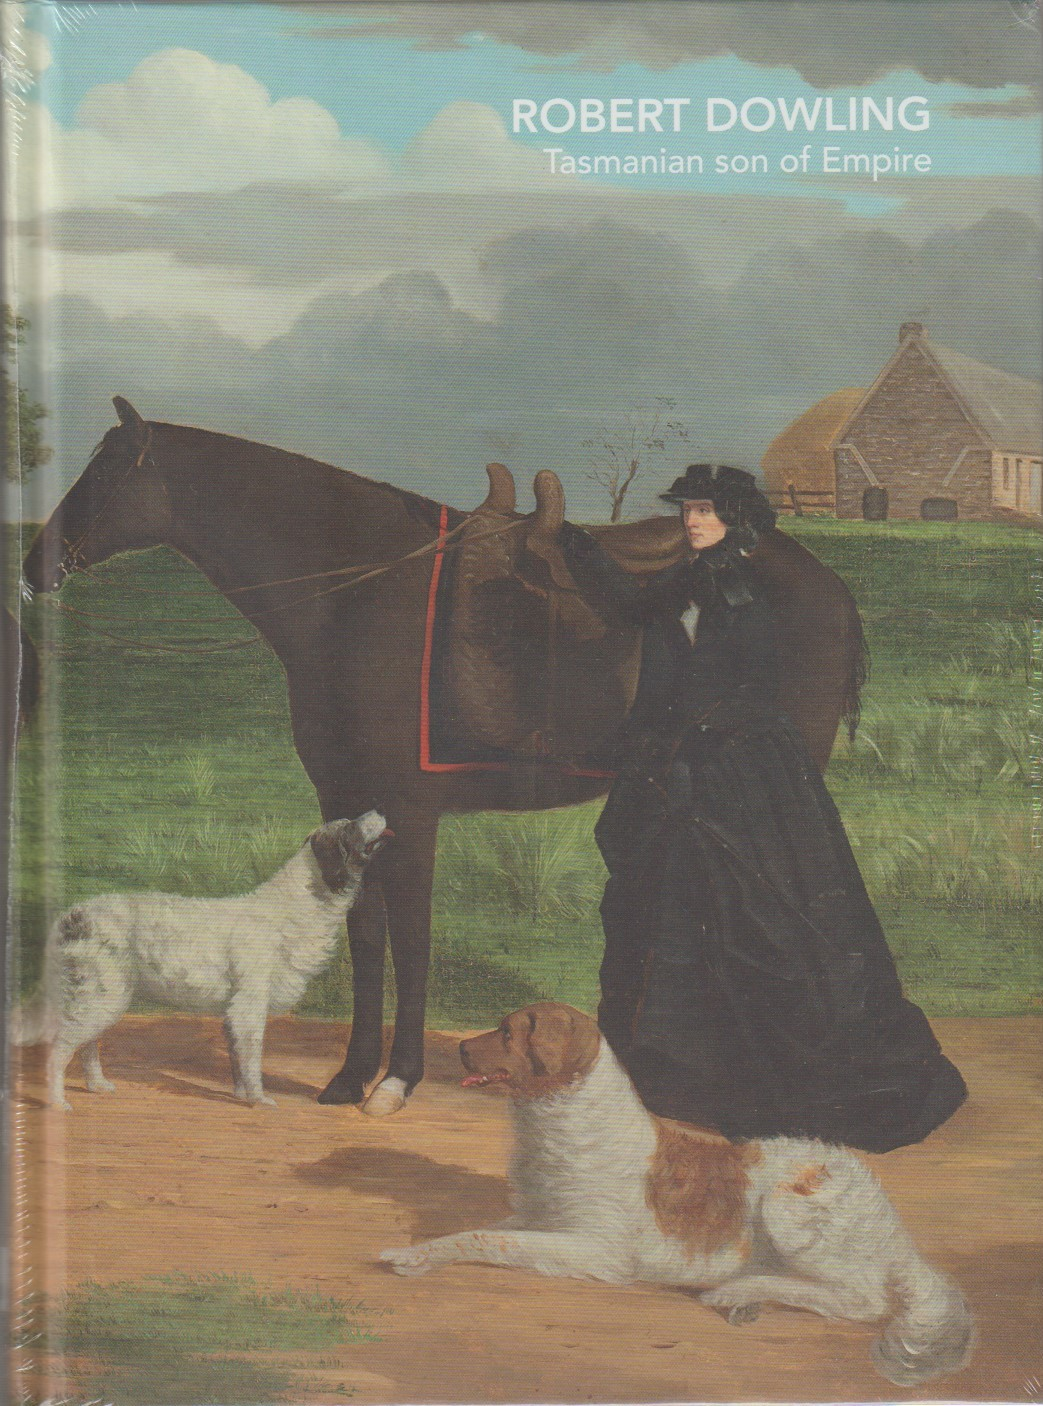 Robert Dowling - Tasmanian Son of Empire